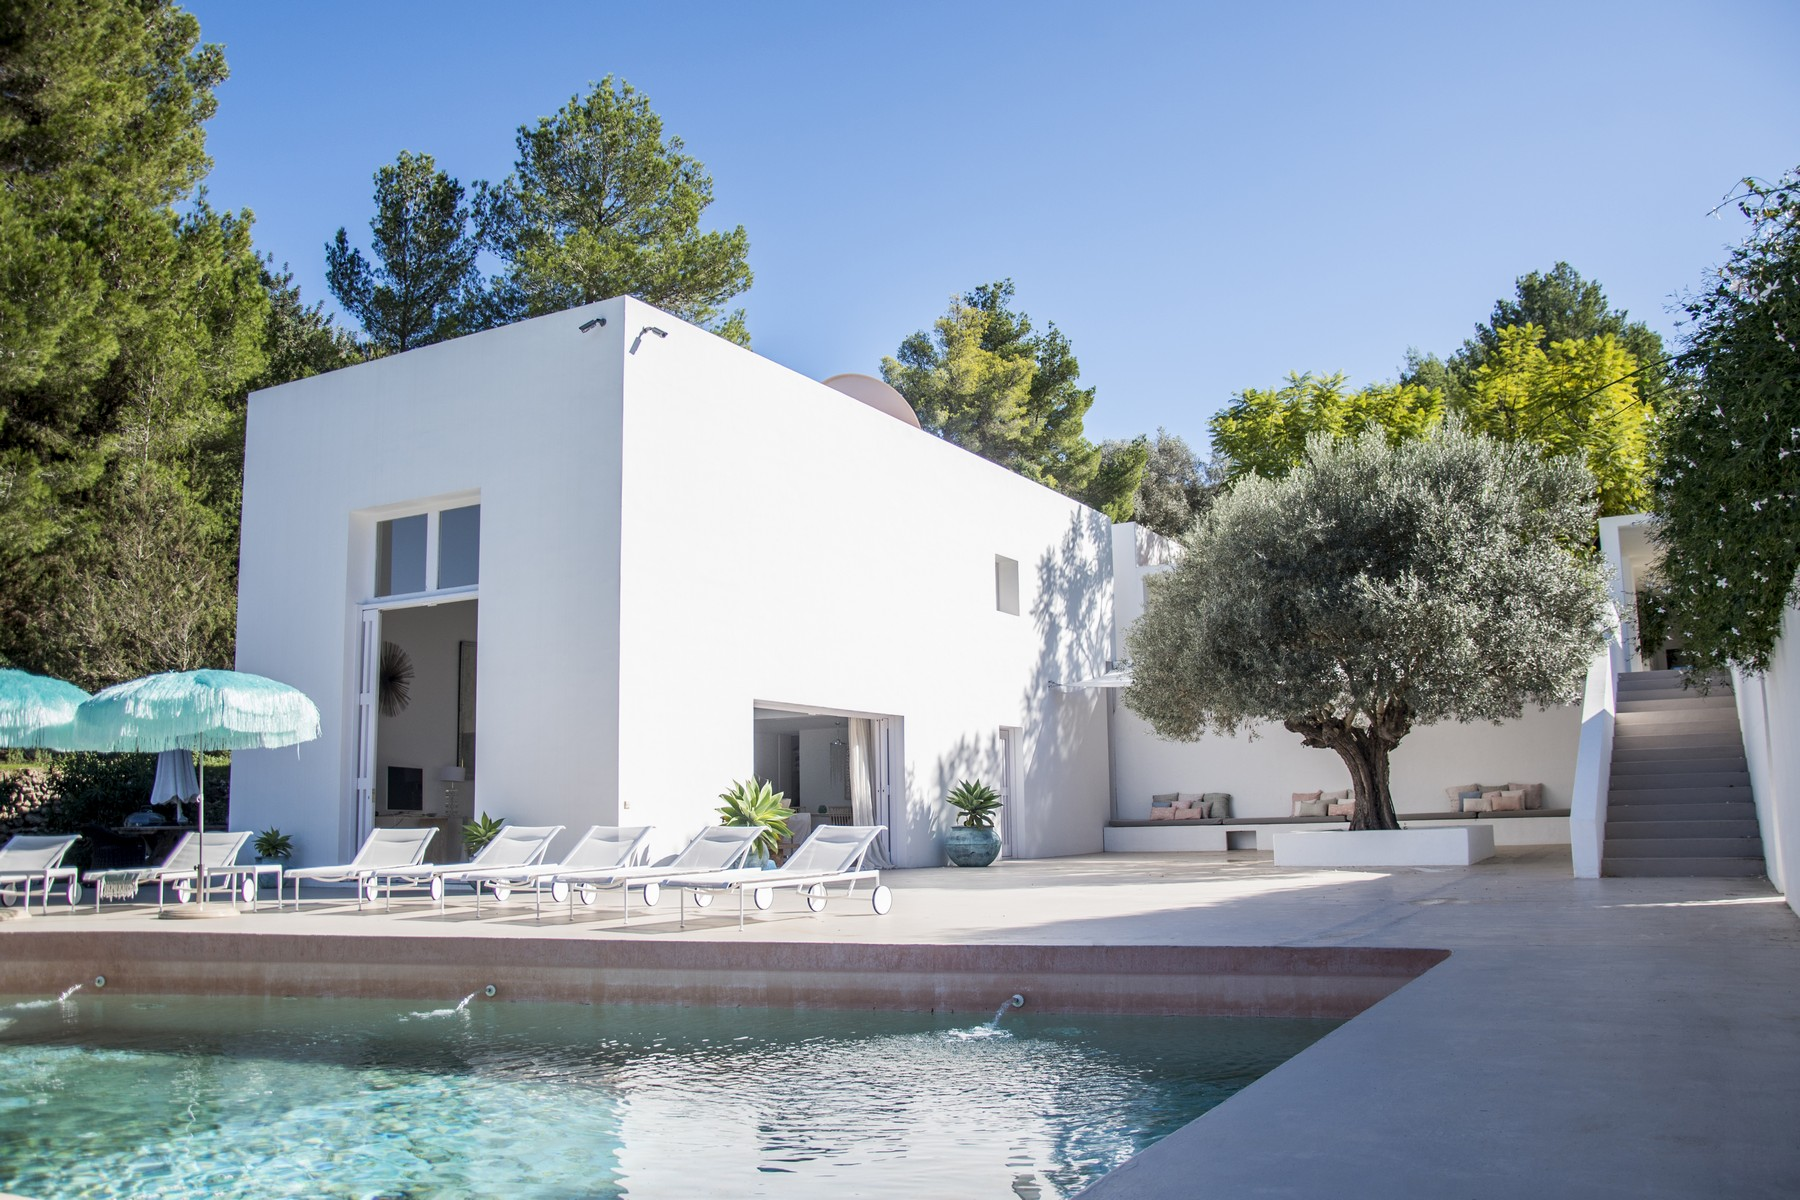 Single Family Home for Sale at West Facing Minimalist Villa Set In San Juan San Juan, Ibiza, 07810 Spain